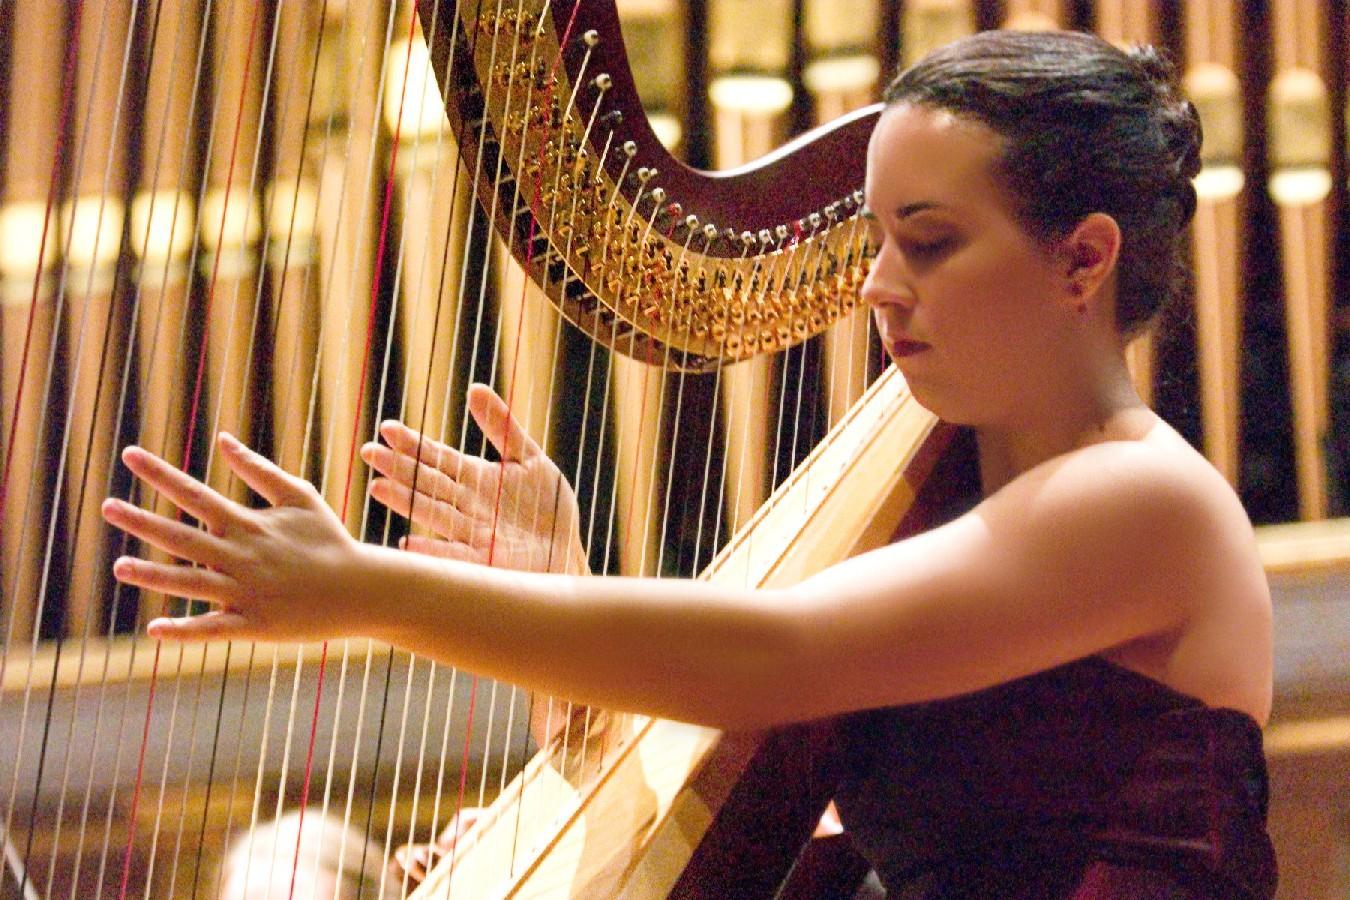 Harp, Musician, Classical, Concerto, Harpist - nadia pessoa